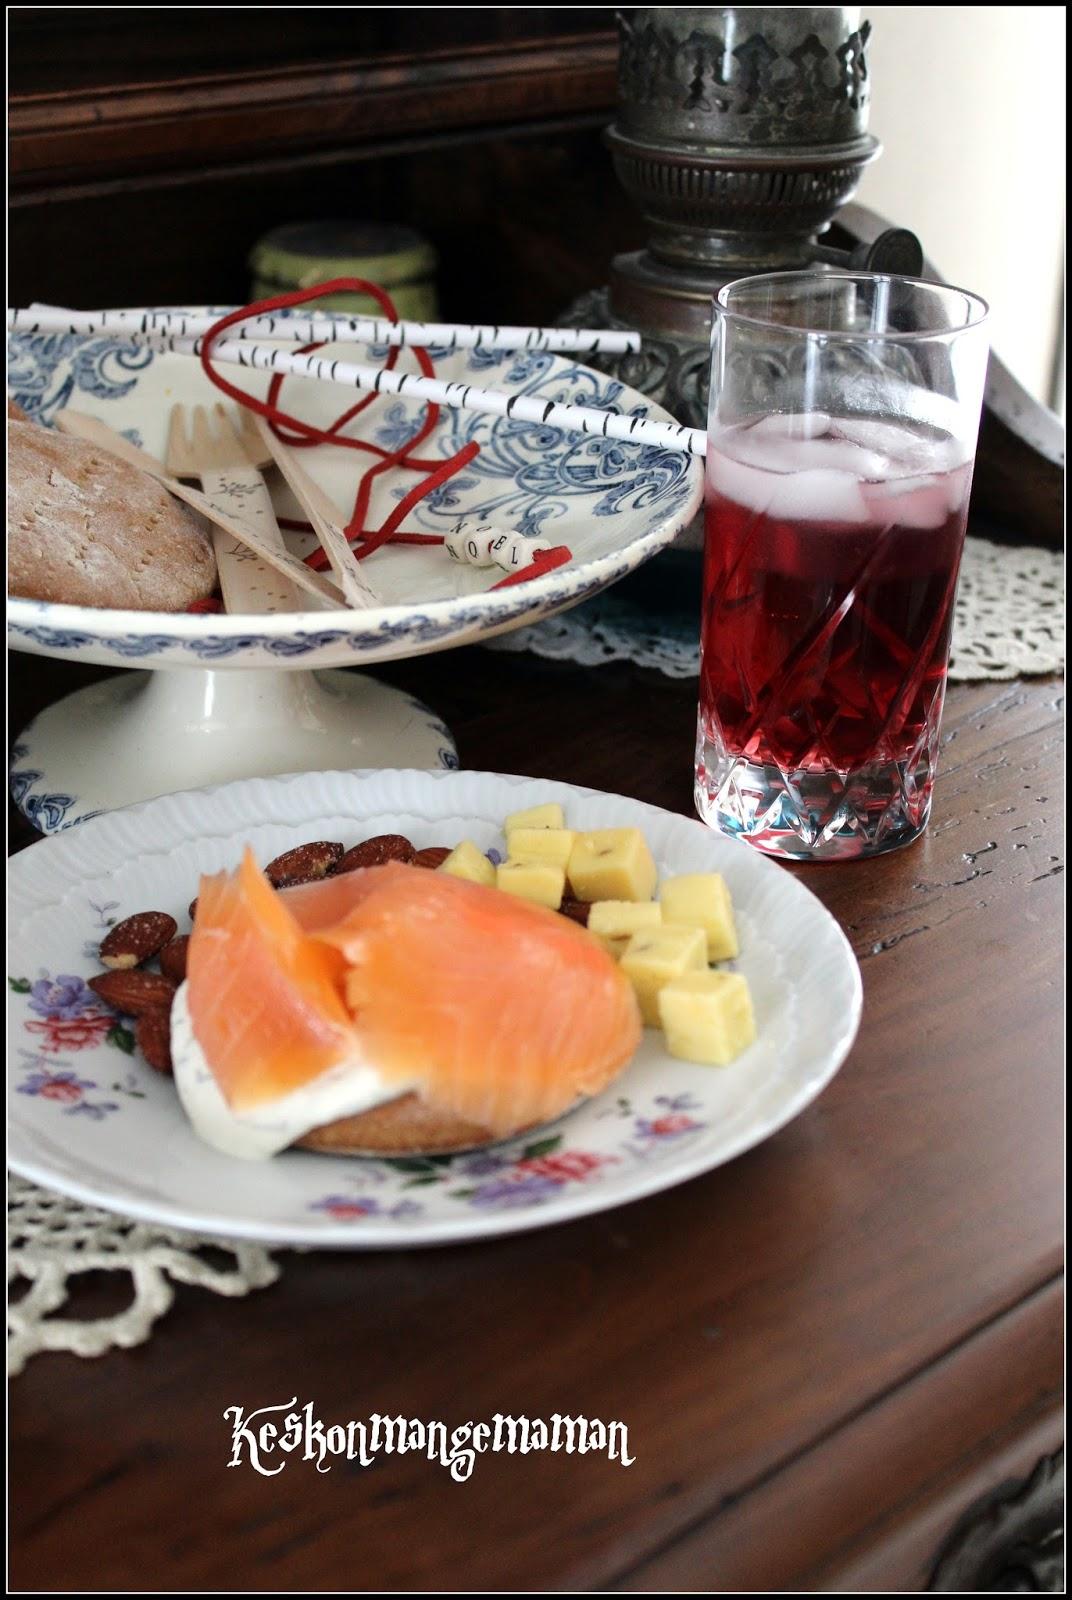 keskonmangemaman no l en scandinavie mardi l 39 ap ro vodka cranberries et myrtilles et. Black Bedroom Furniture Sets. Home Design Ideas